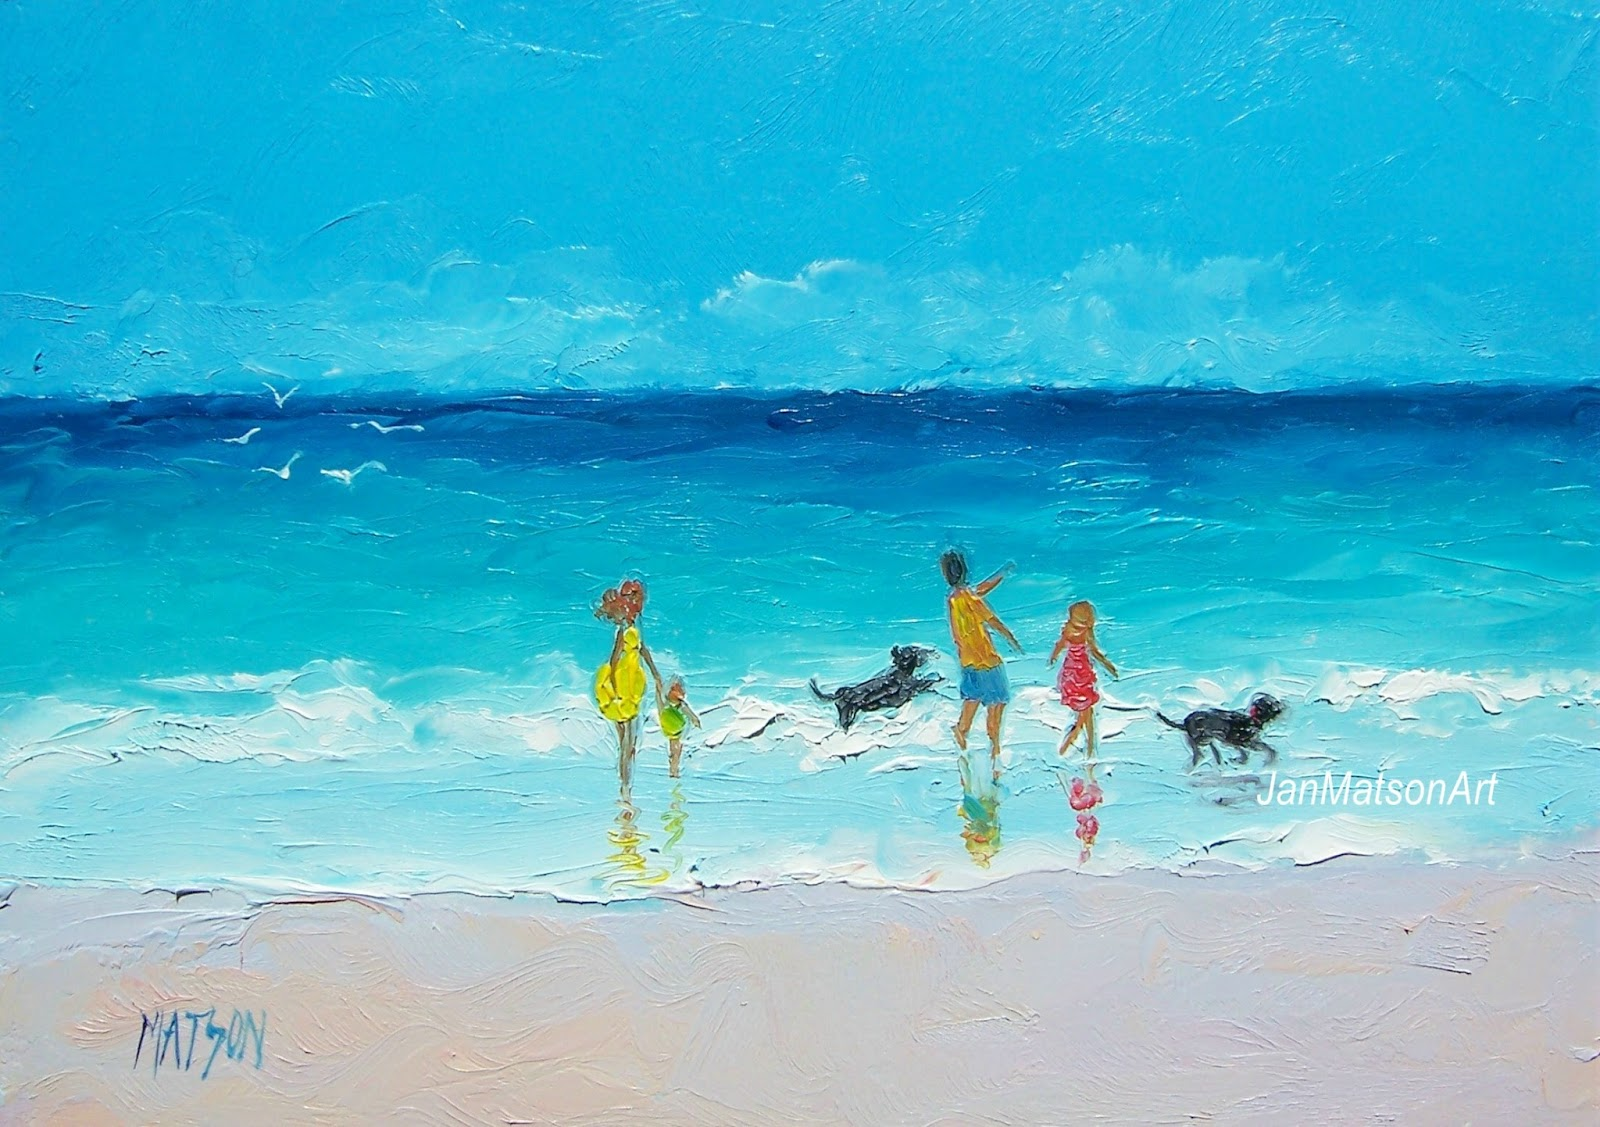 jan matson etsy art: etsy art, beach scenes 'sea breeze'